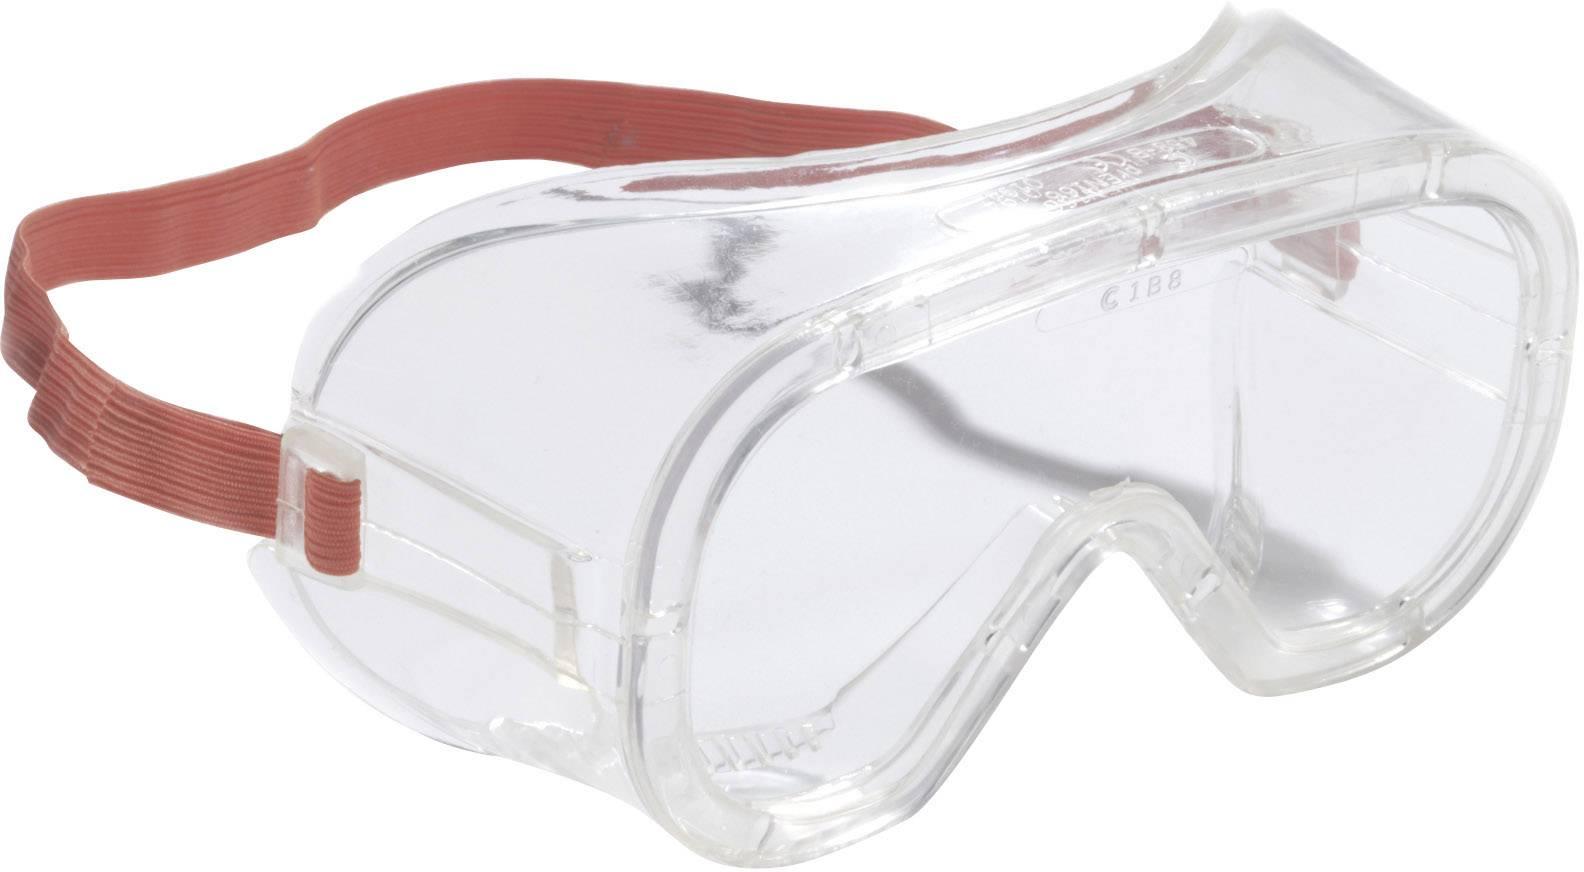 Uzatvorené ochranné okuliare 3M 71347-00004C